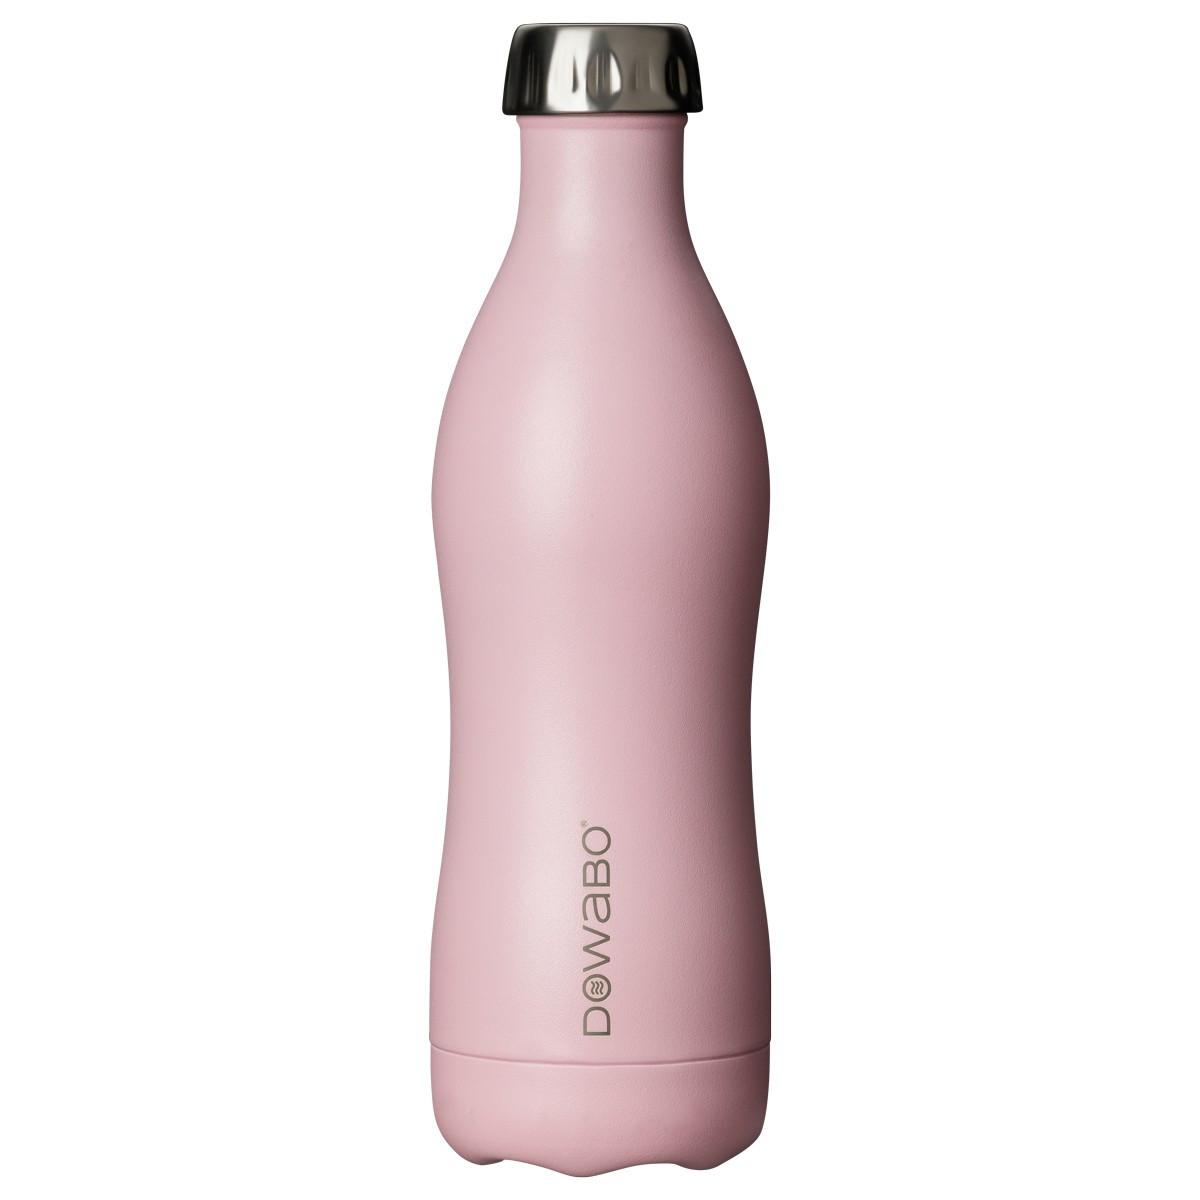 DOWABO® Bottle - Flamingo 500ml Cocktail Collection